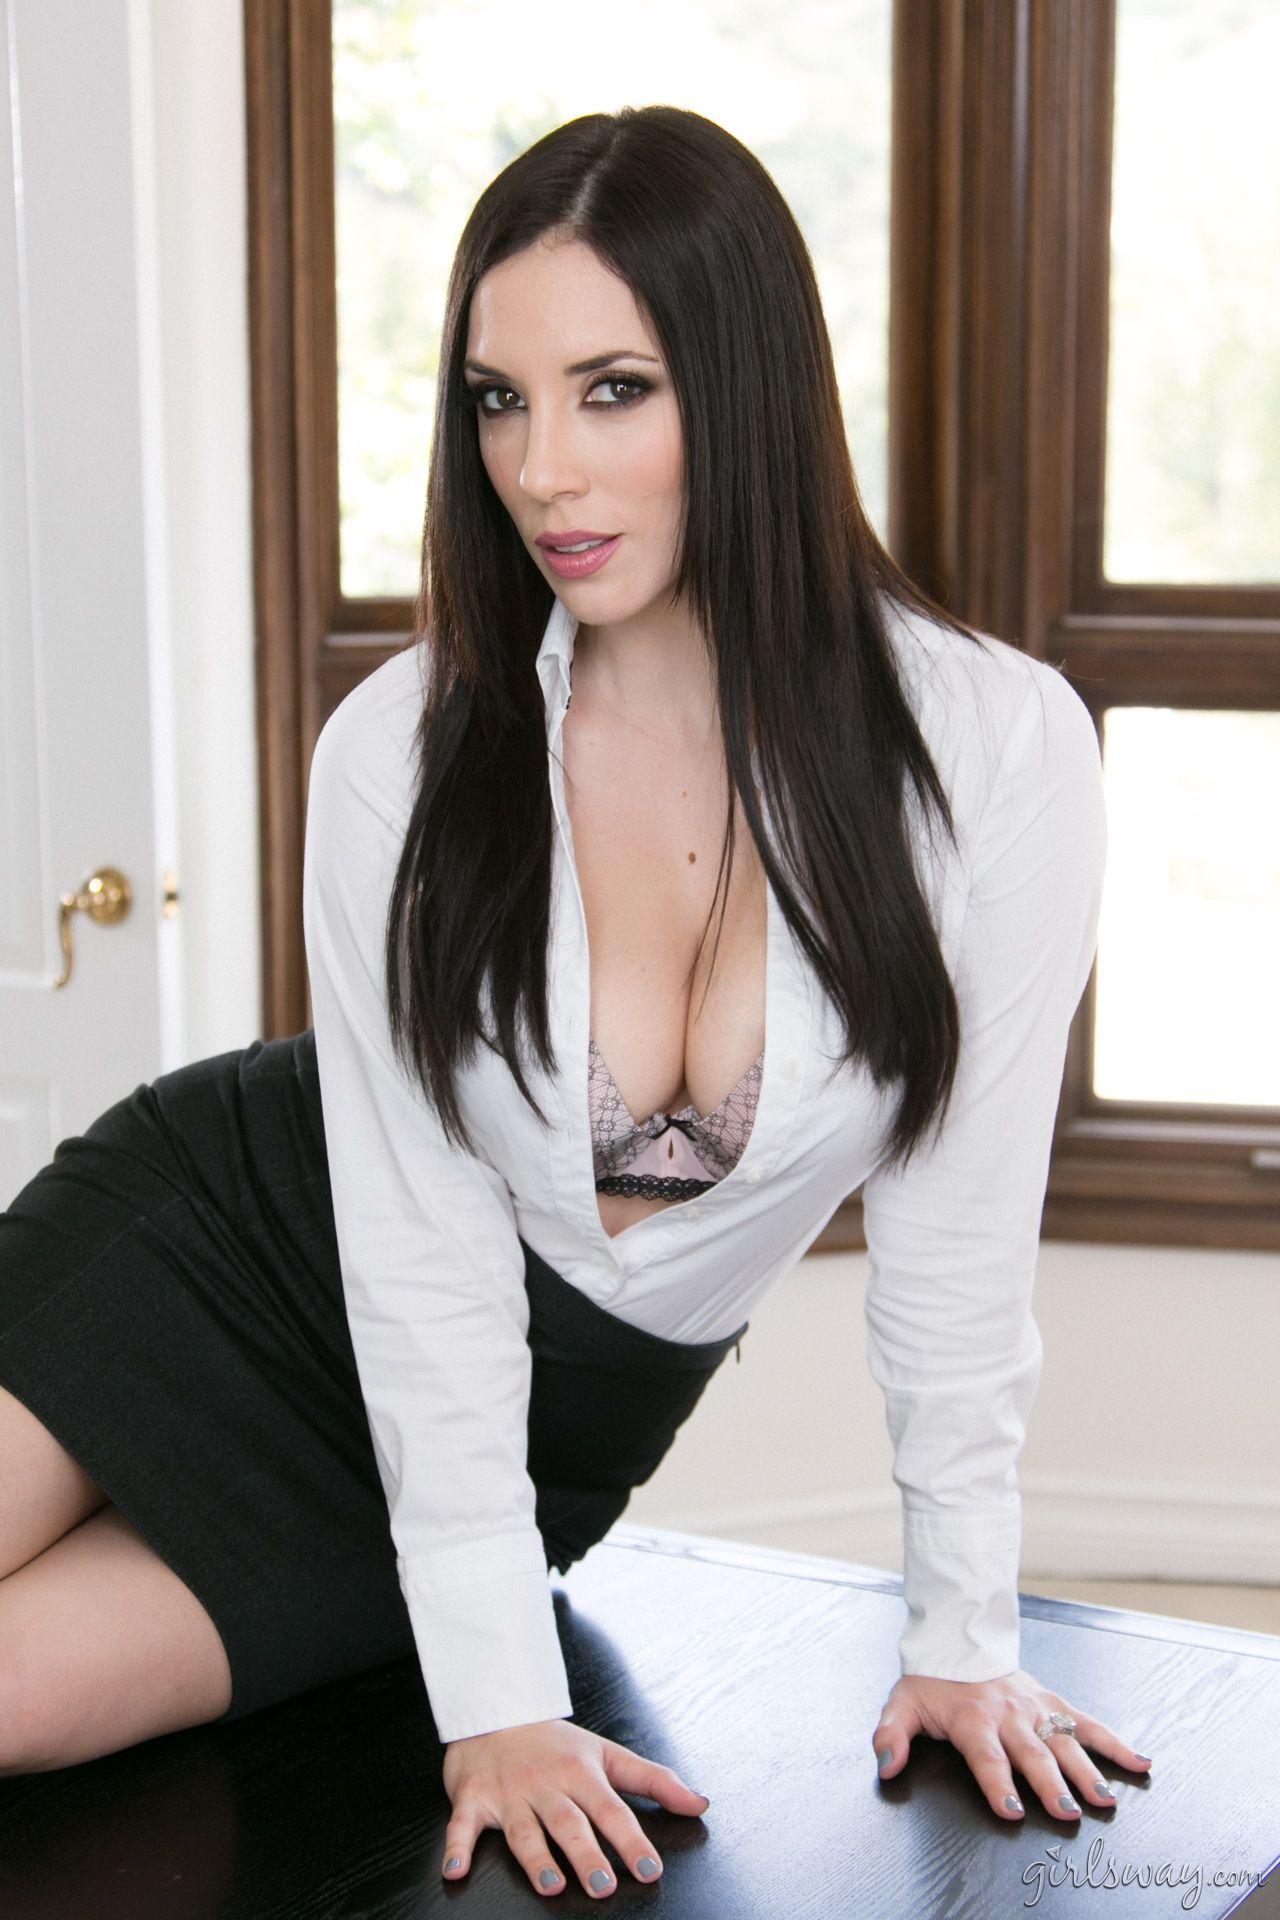 Jelena Jensen Popped Collar Blouse Lady Outfit Clothes Beautiful Secretary